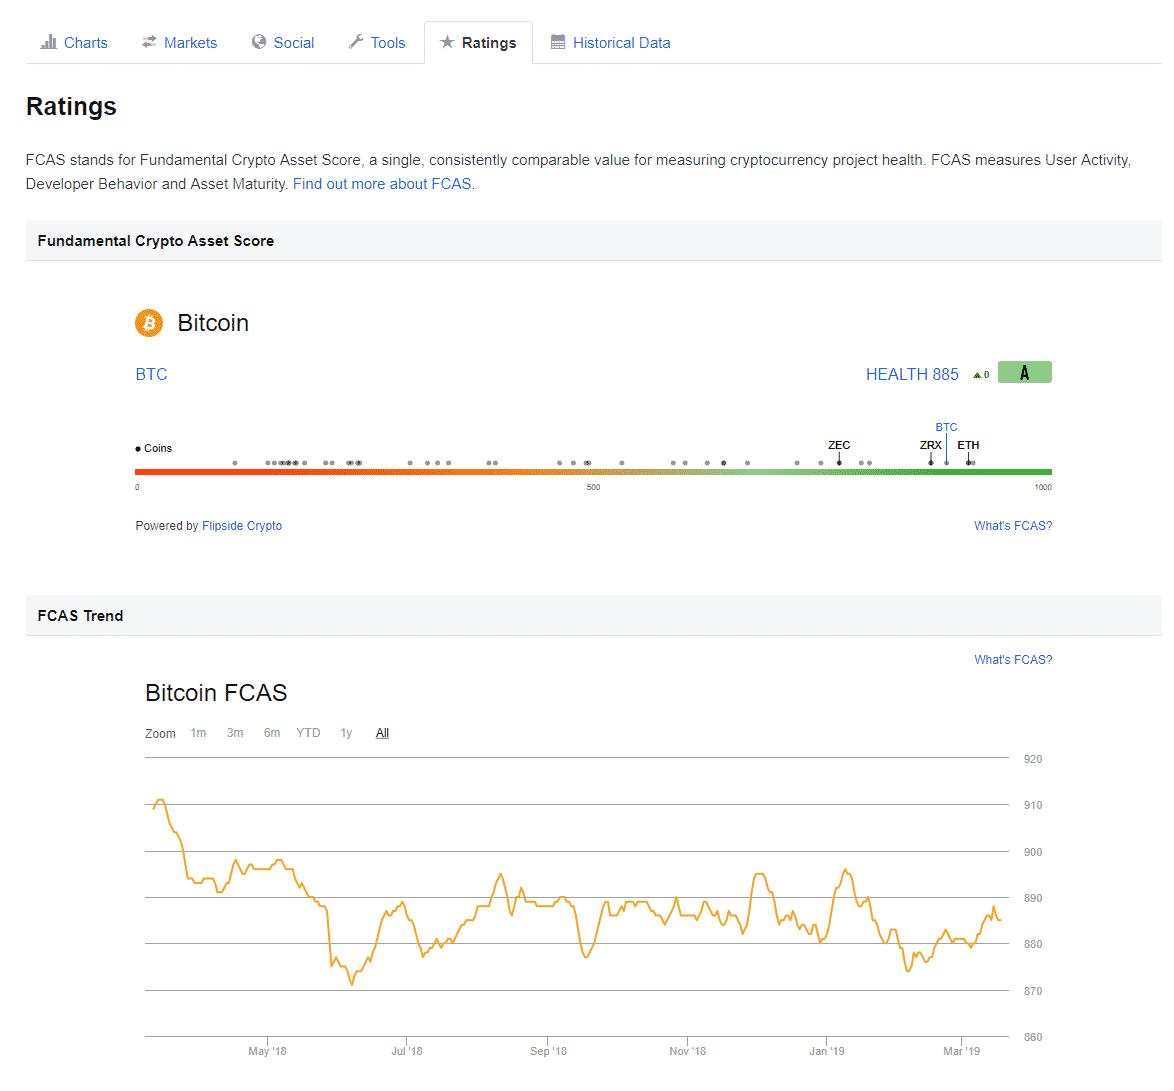 Fundamental Crypto Asset Score